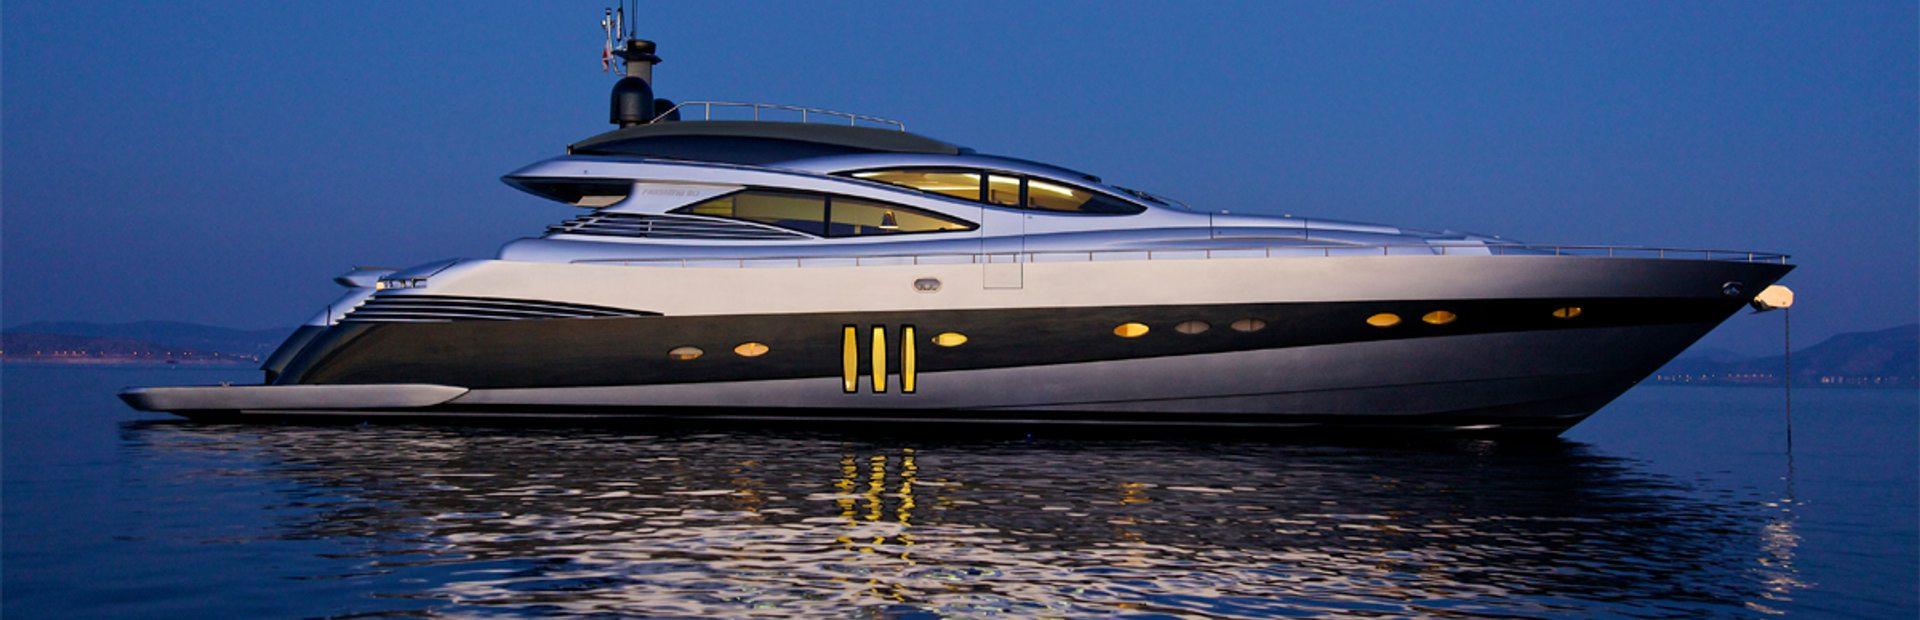 Pershing 90 Yacht Charter